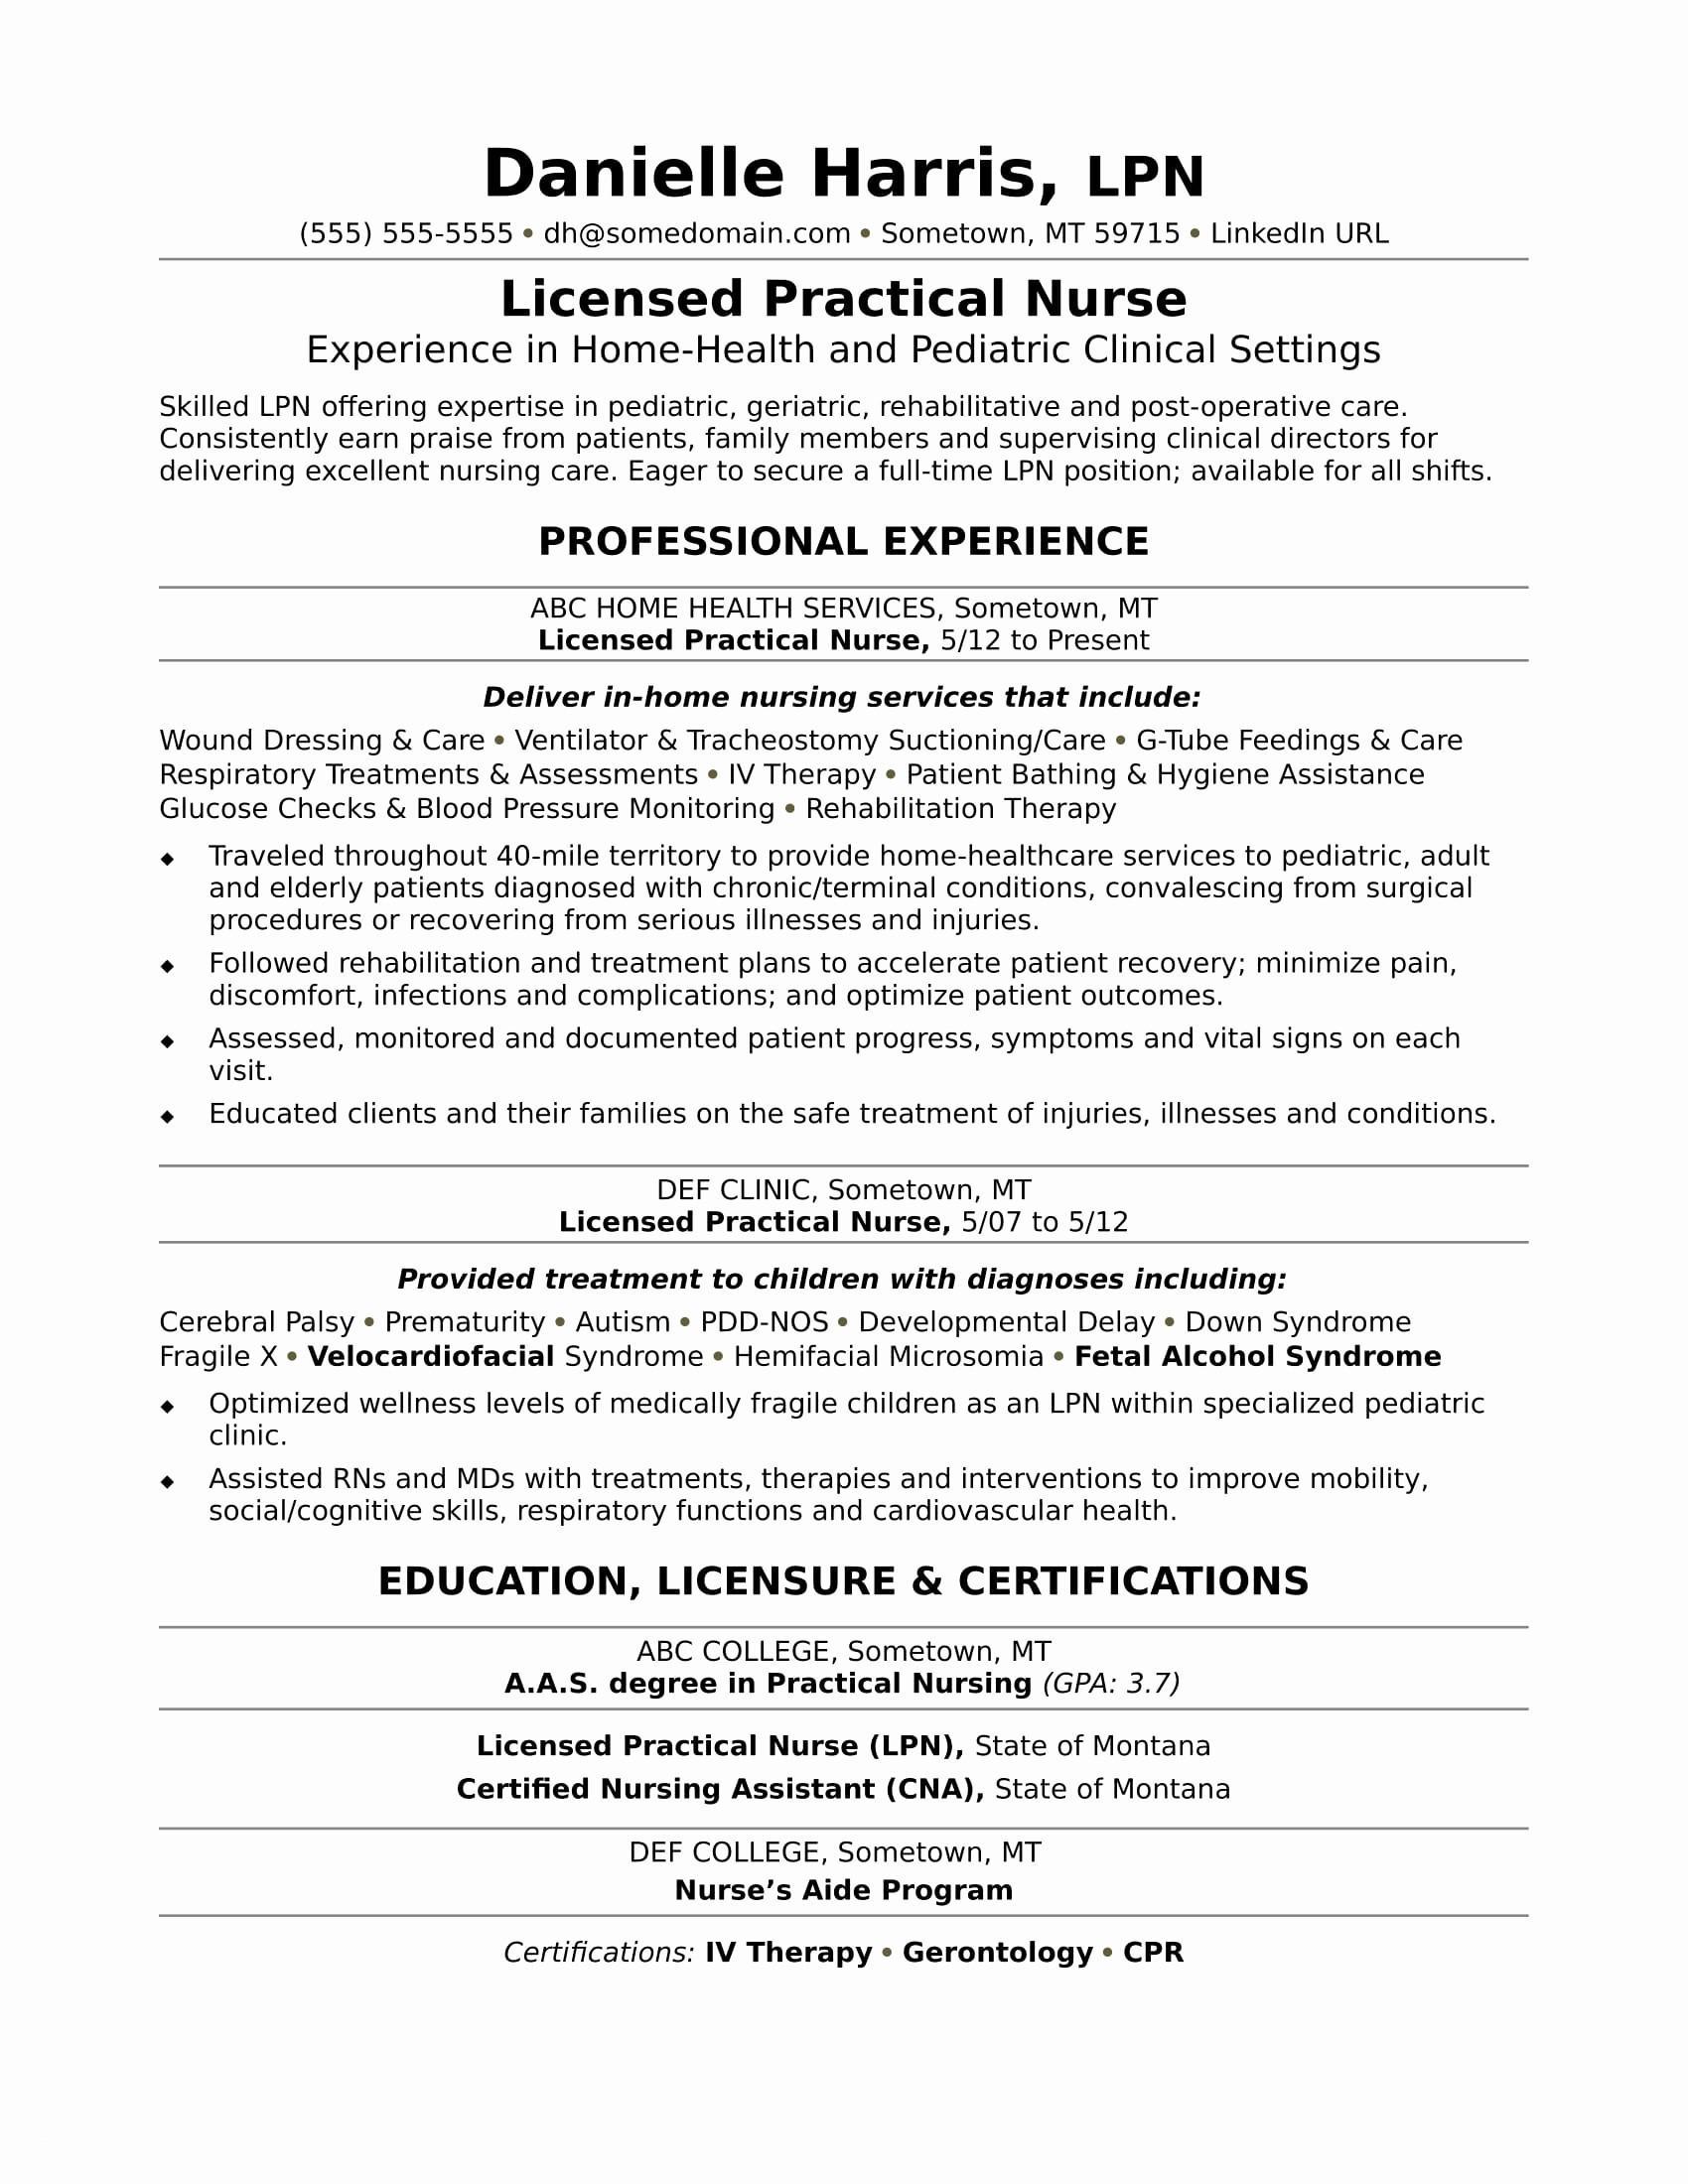 Sample Resume For Nurses Pdf